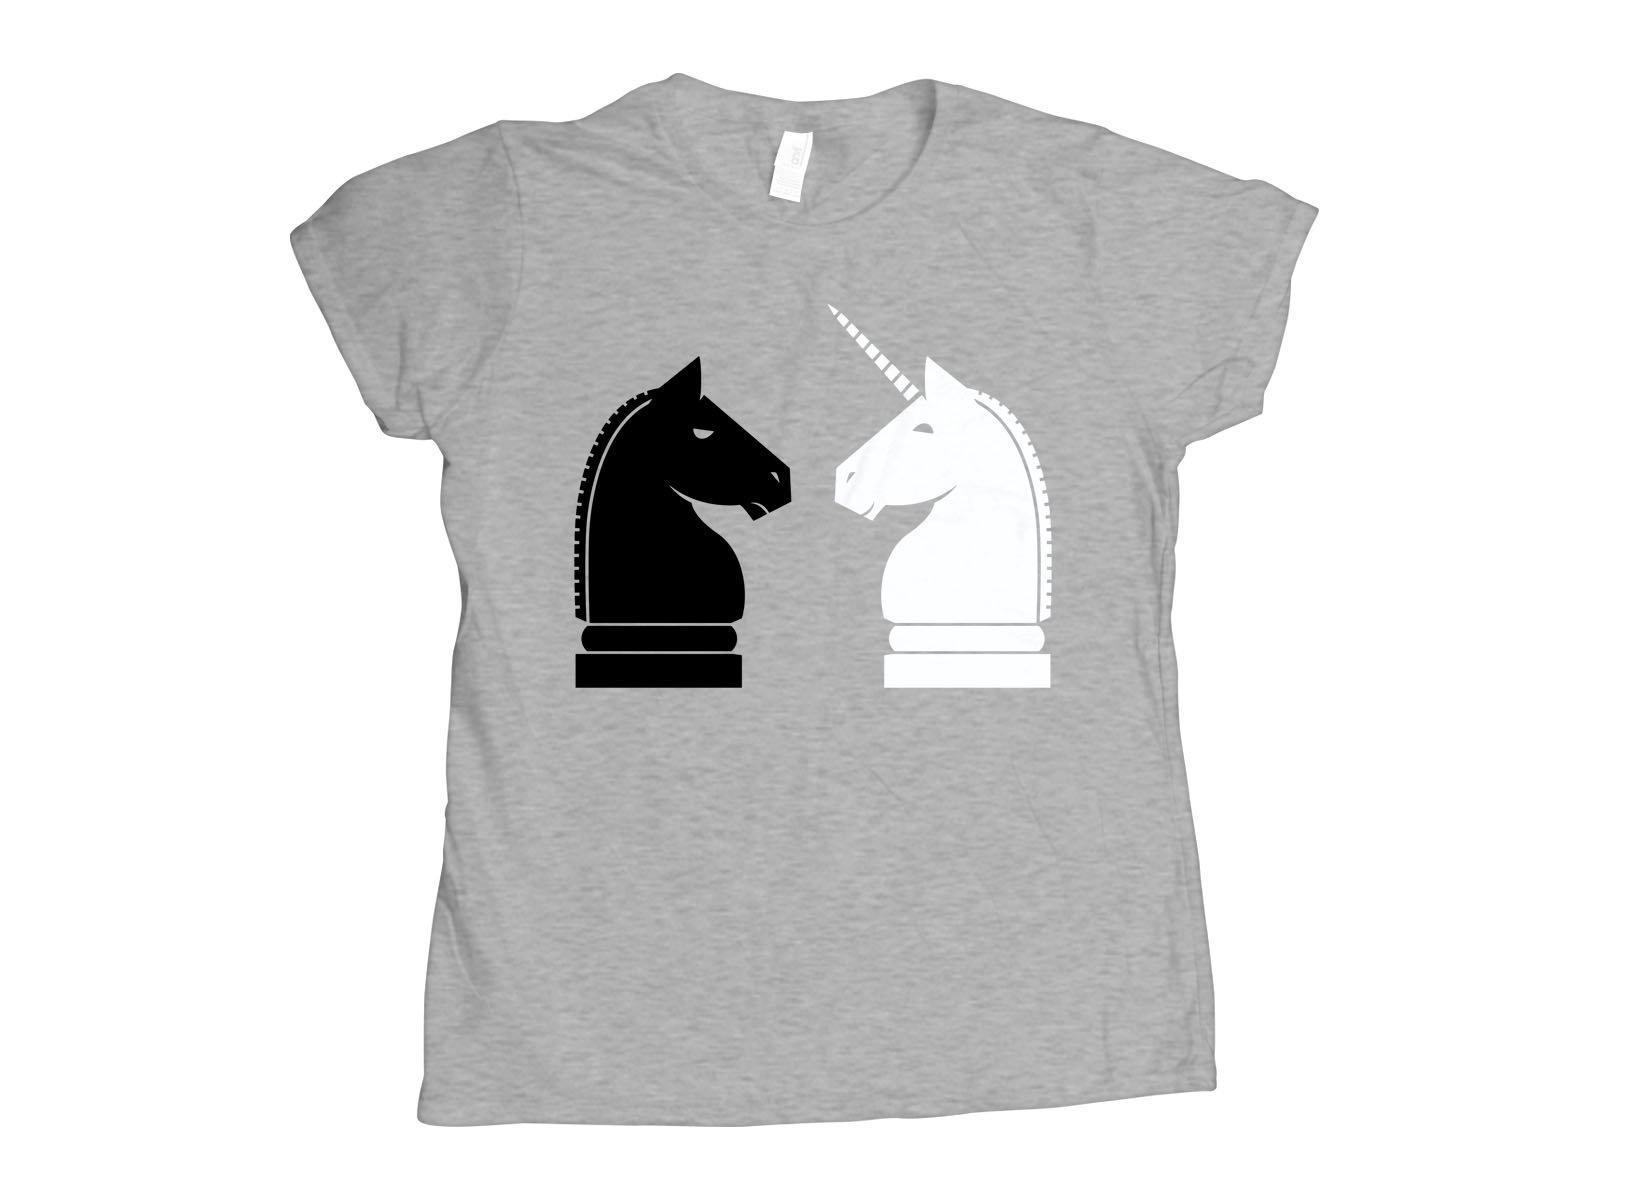 Chess Unicorn on Womens T-Shirt